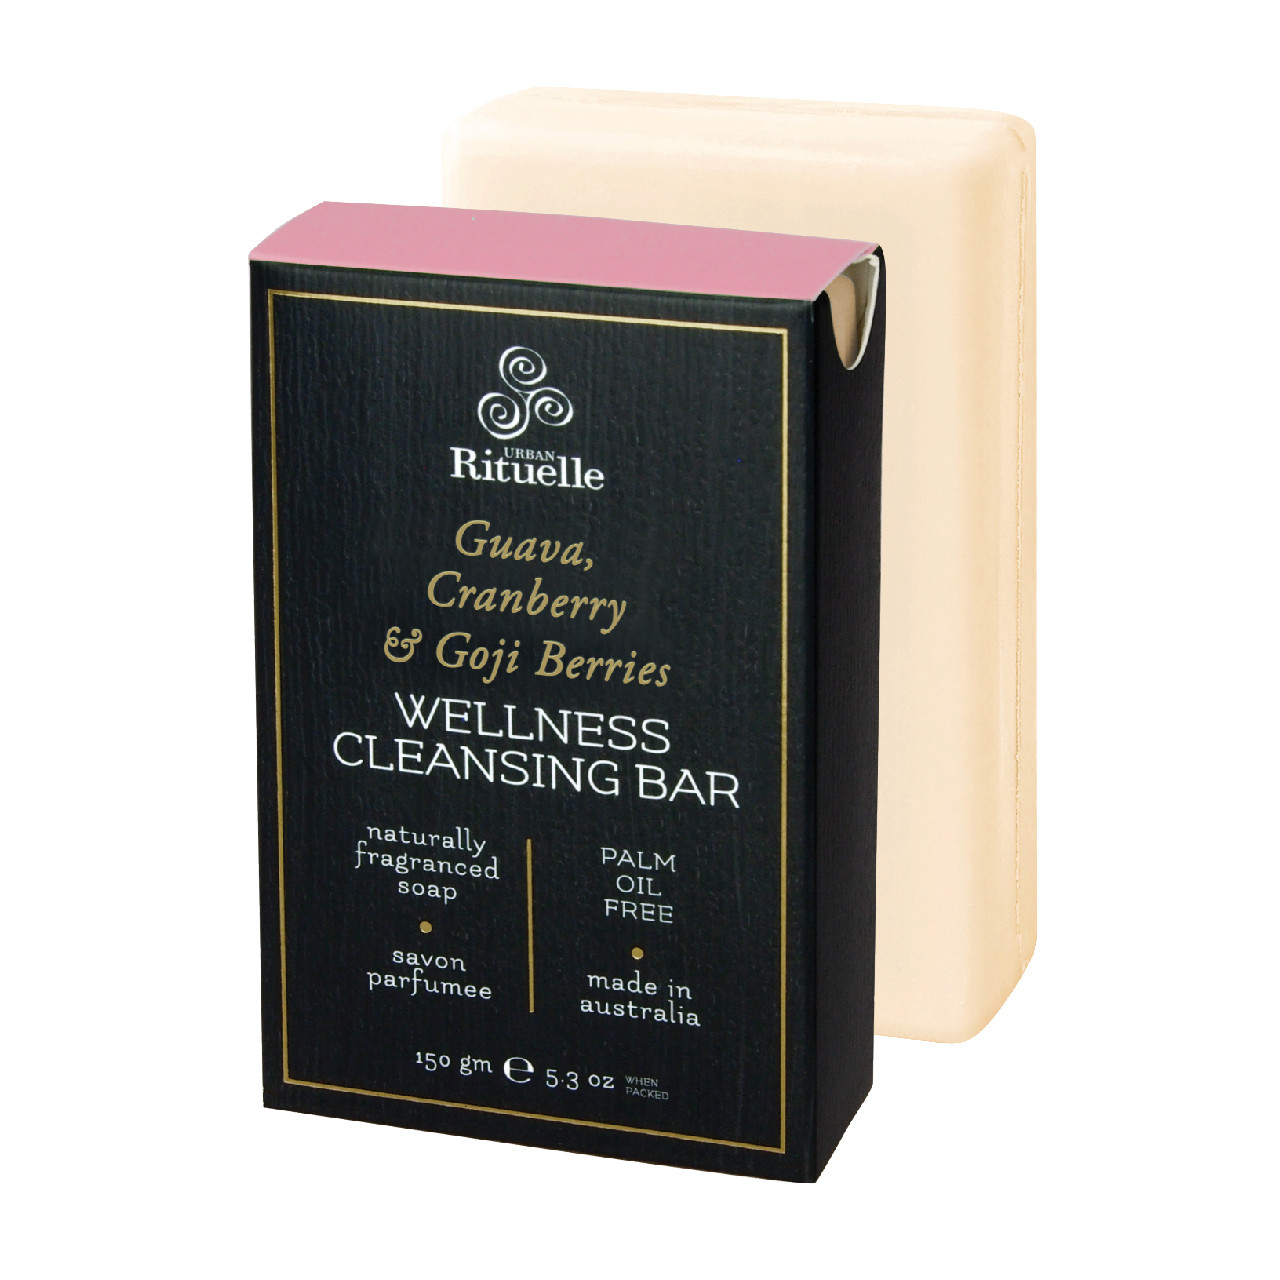 Harvest - Guava - Wellness Cleansing Bar - Urban Rituelle